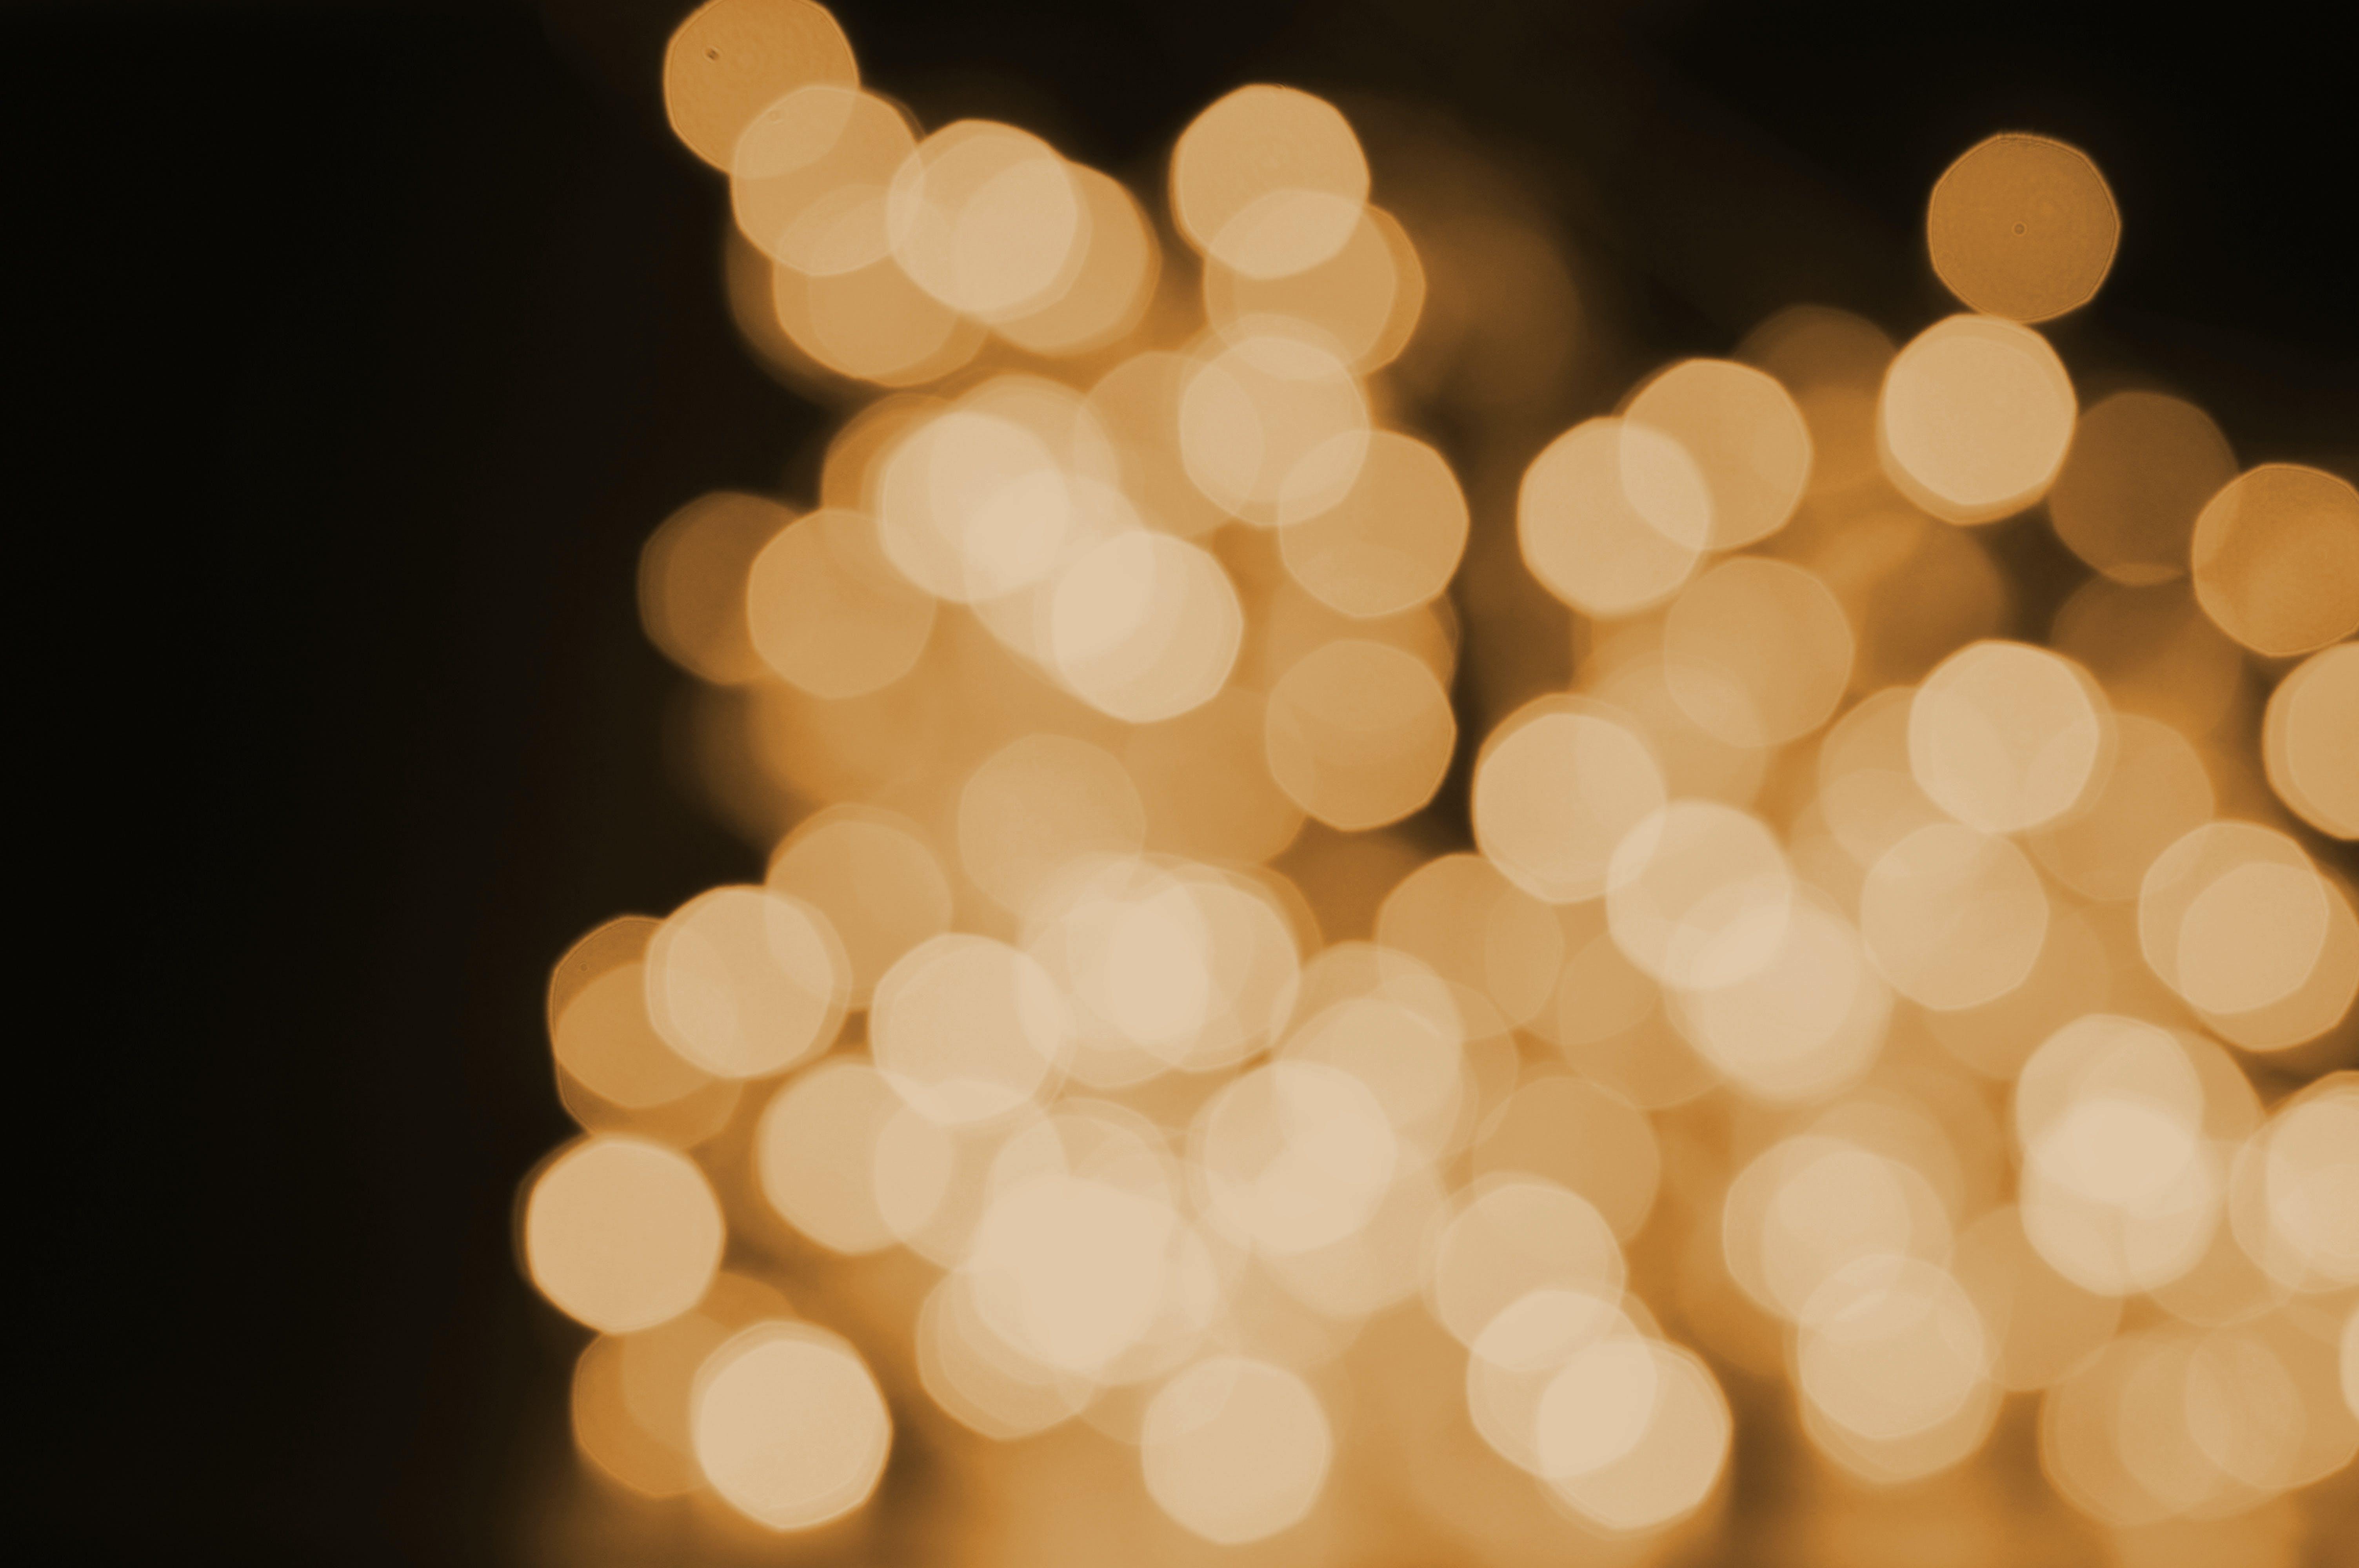 Free stock photo of background, beautiful, blur, blurred